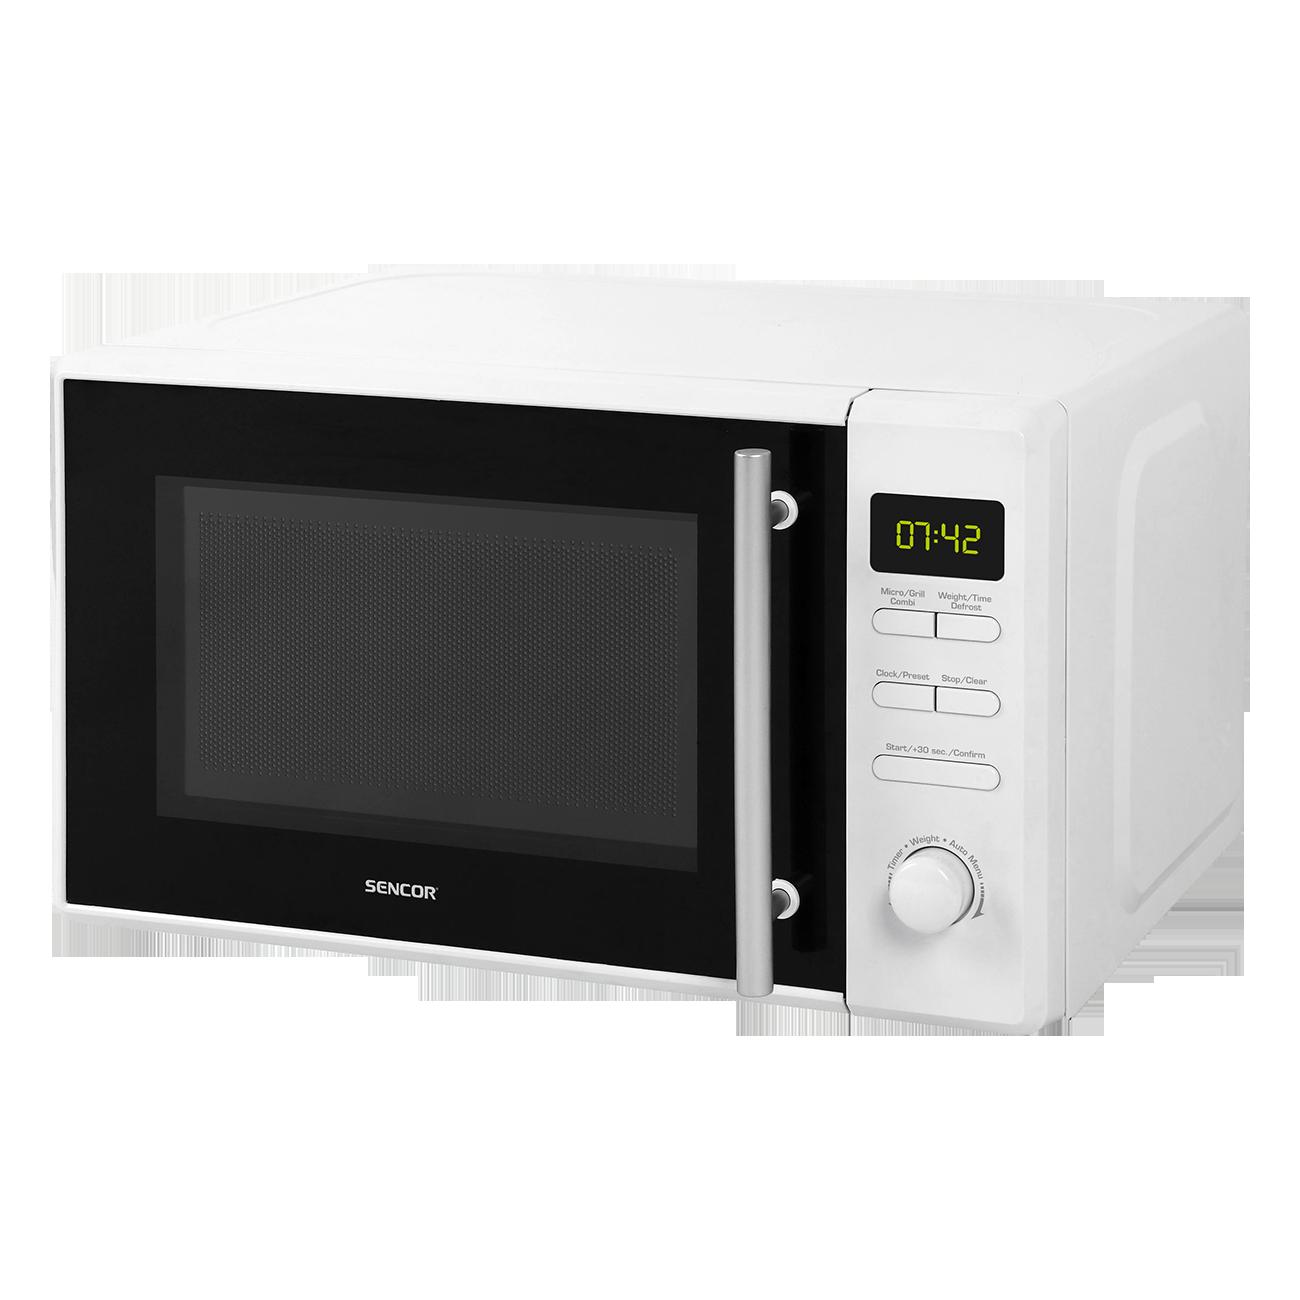 Sencor SMW5220 Mikrohullámú sütő grill funkcióval